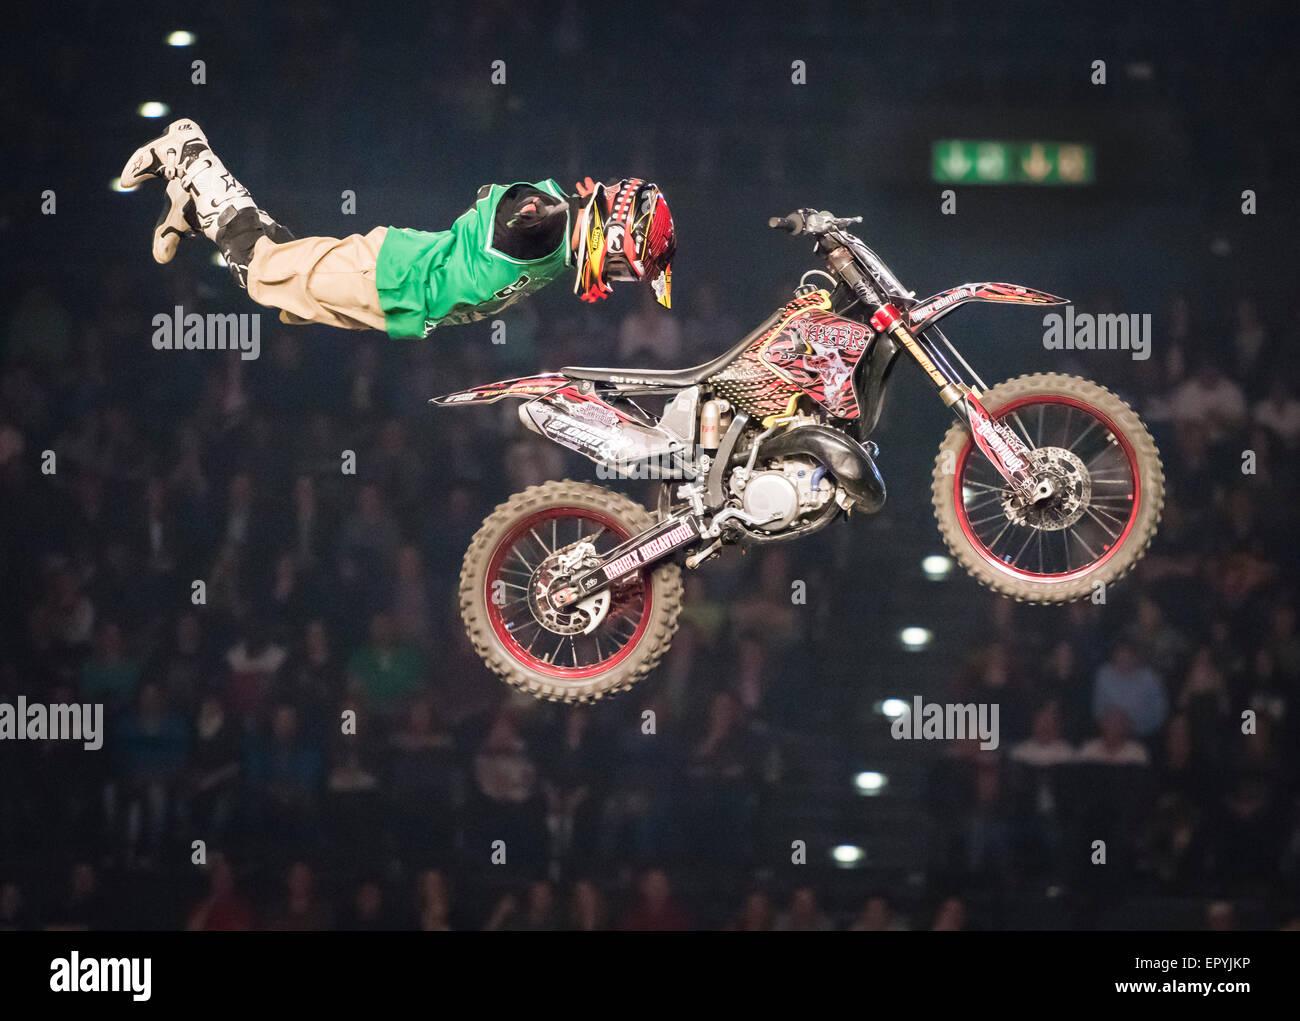 Zurich, Suiza. 22 de mayo de 2015. Alta FMX saltos espectaculares en 'Maestros de Dirt' freestyle motocross Imagen De Stock